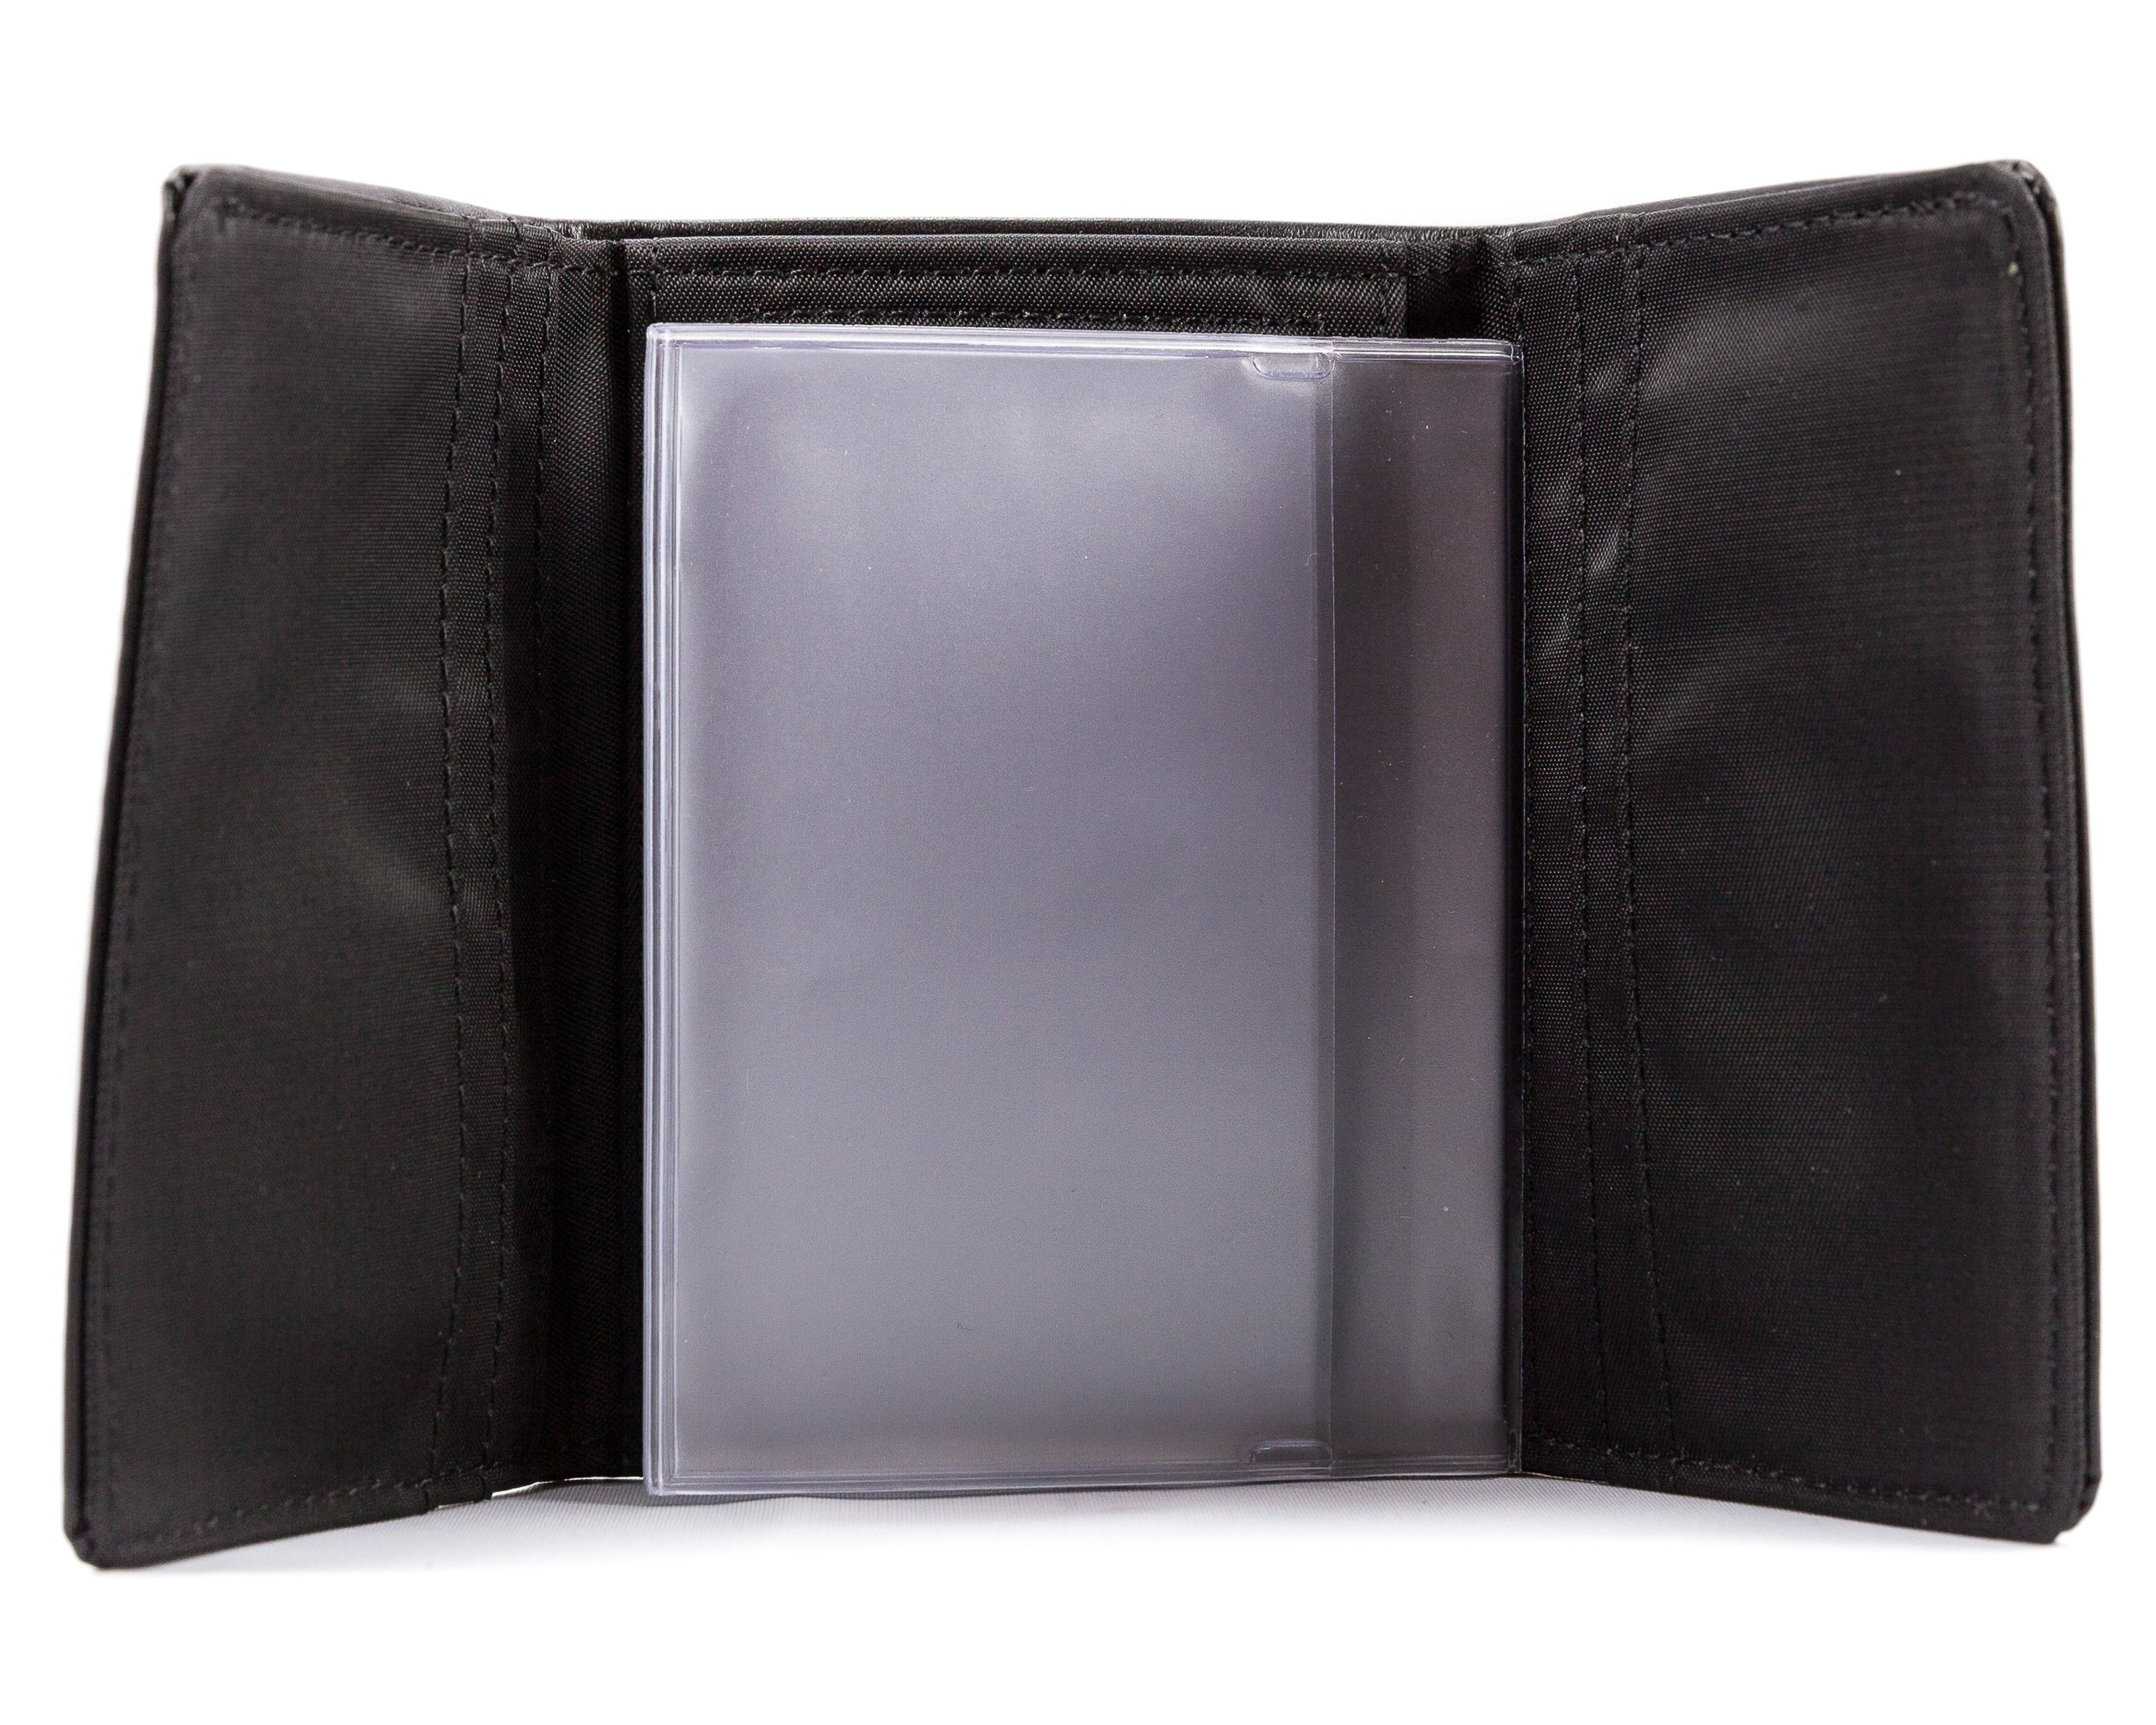 Big Skinny Men's Wallet Insert Tri-fold Transparent